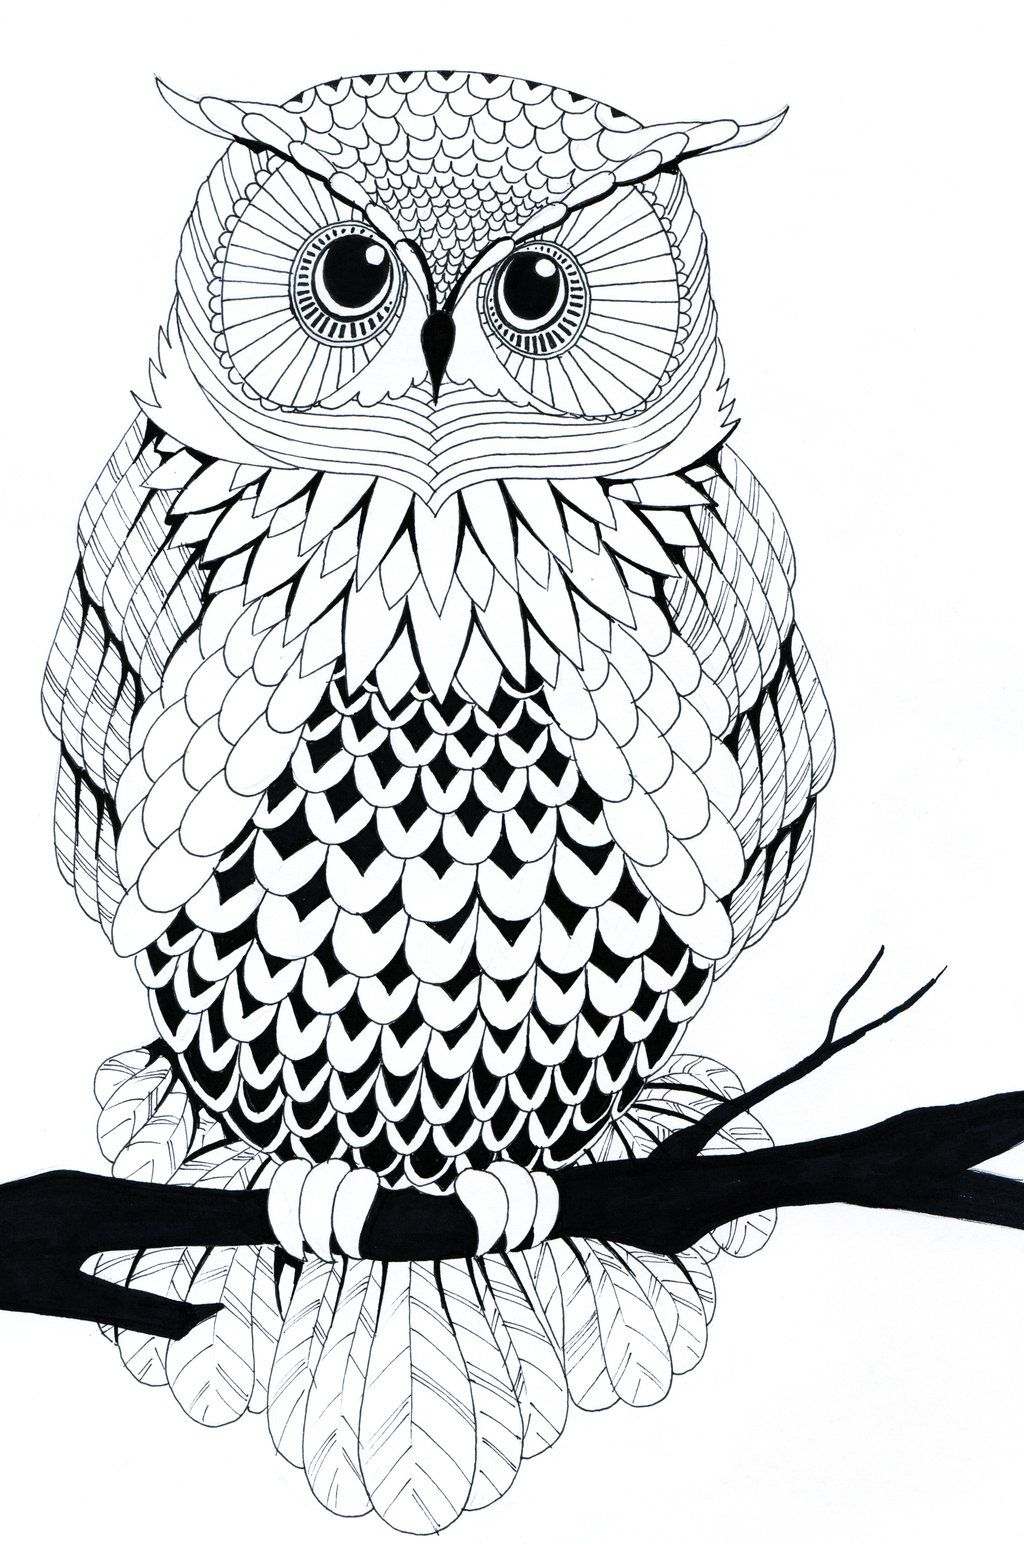 Black And White Owl By Zakariaseatworld On Deviantart